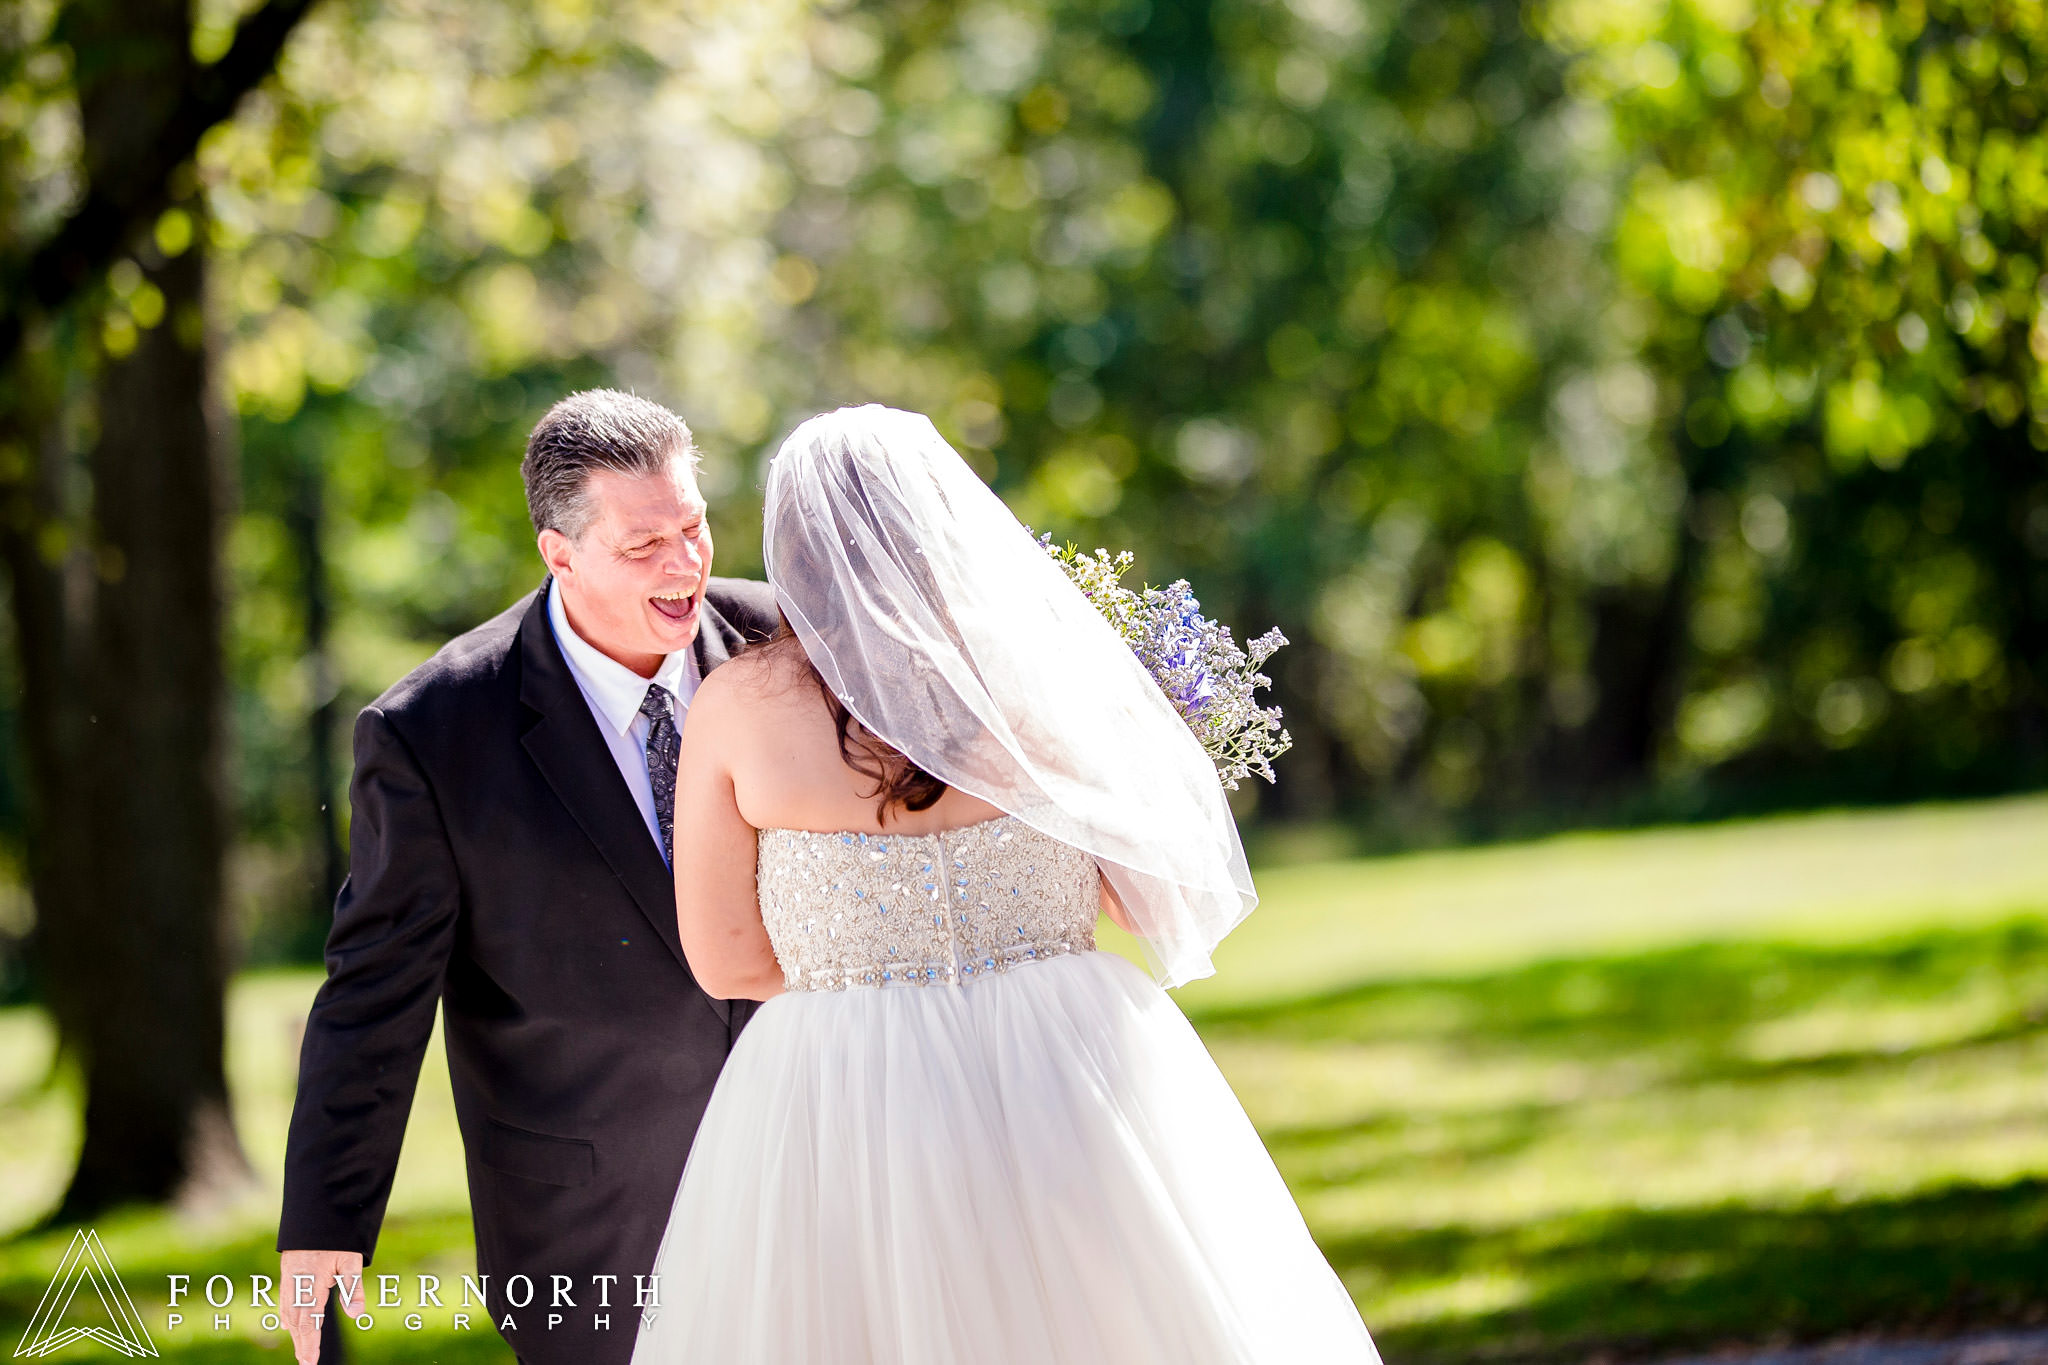 Brown-Allaire-State-Park-Wedding-Photographer-15.JPG